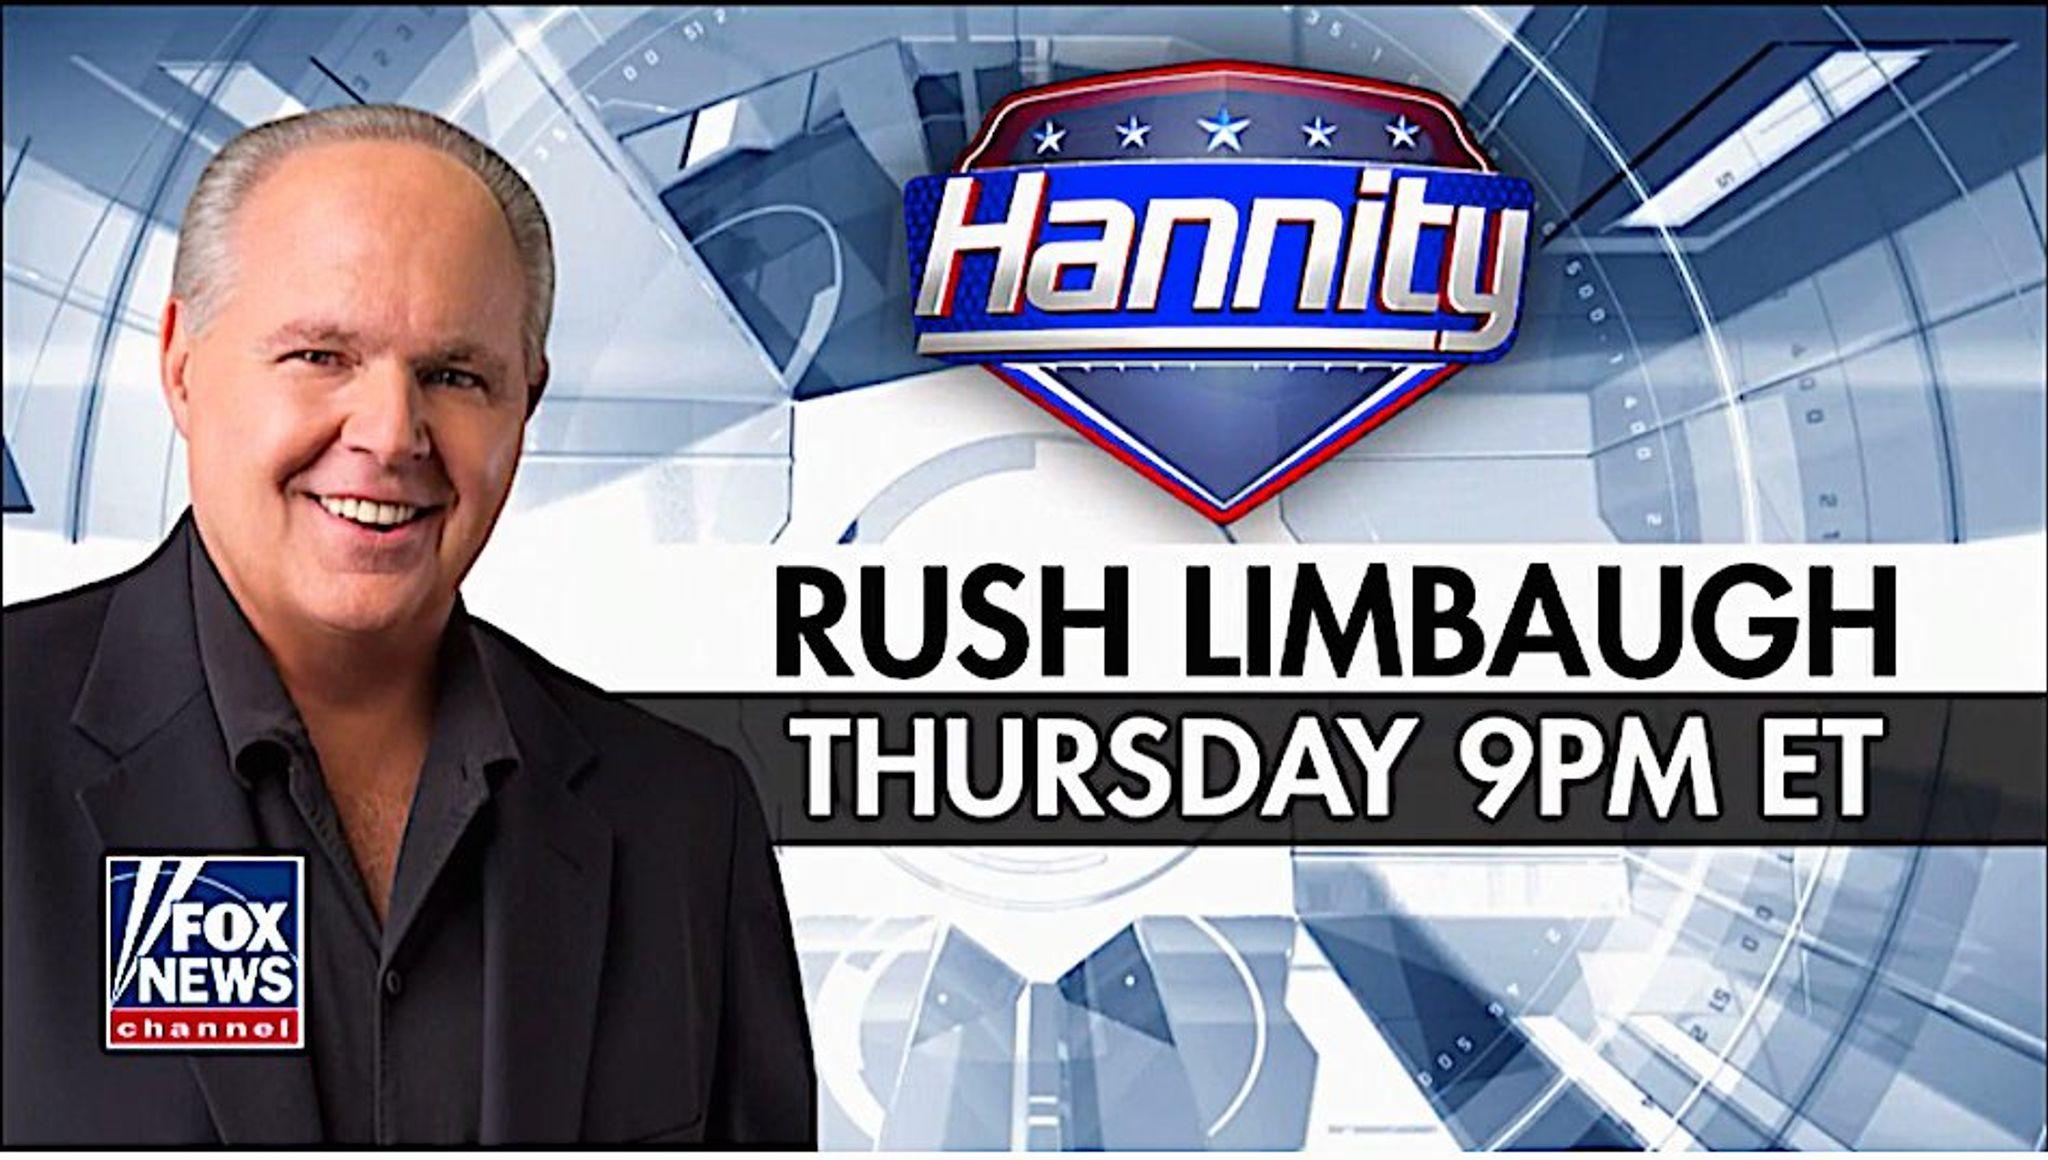 Dream team: Rush Limbaugh and Fox News